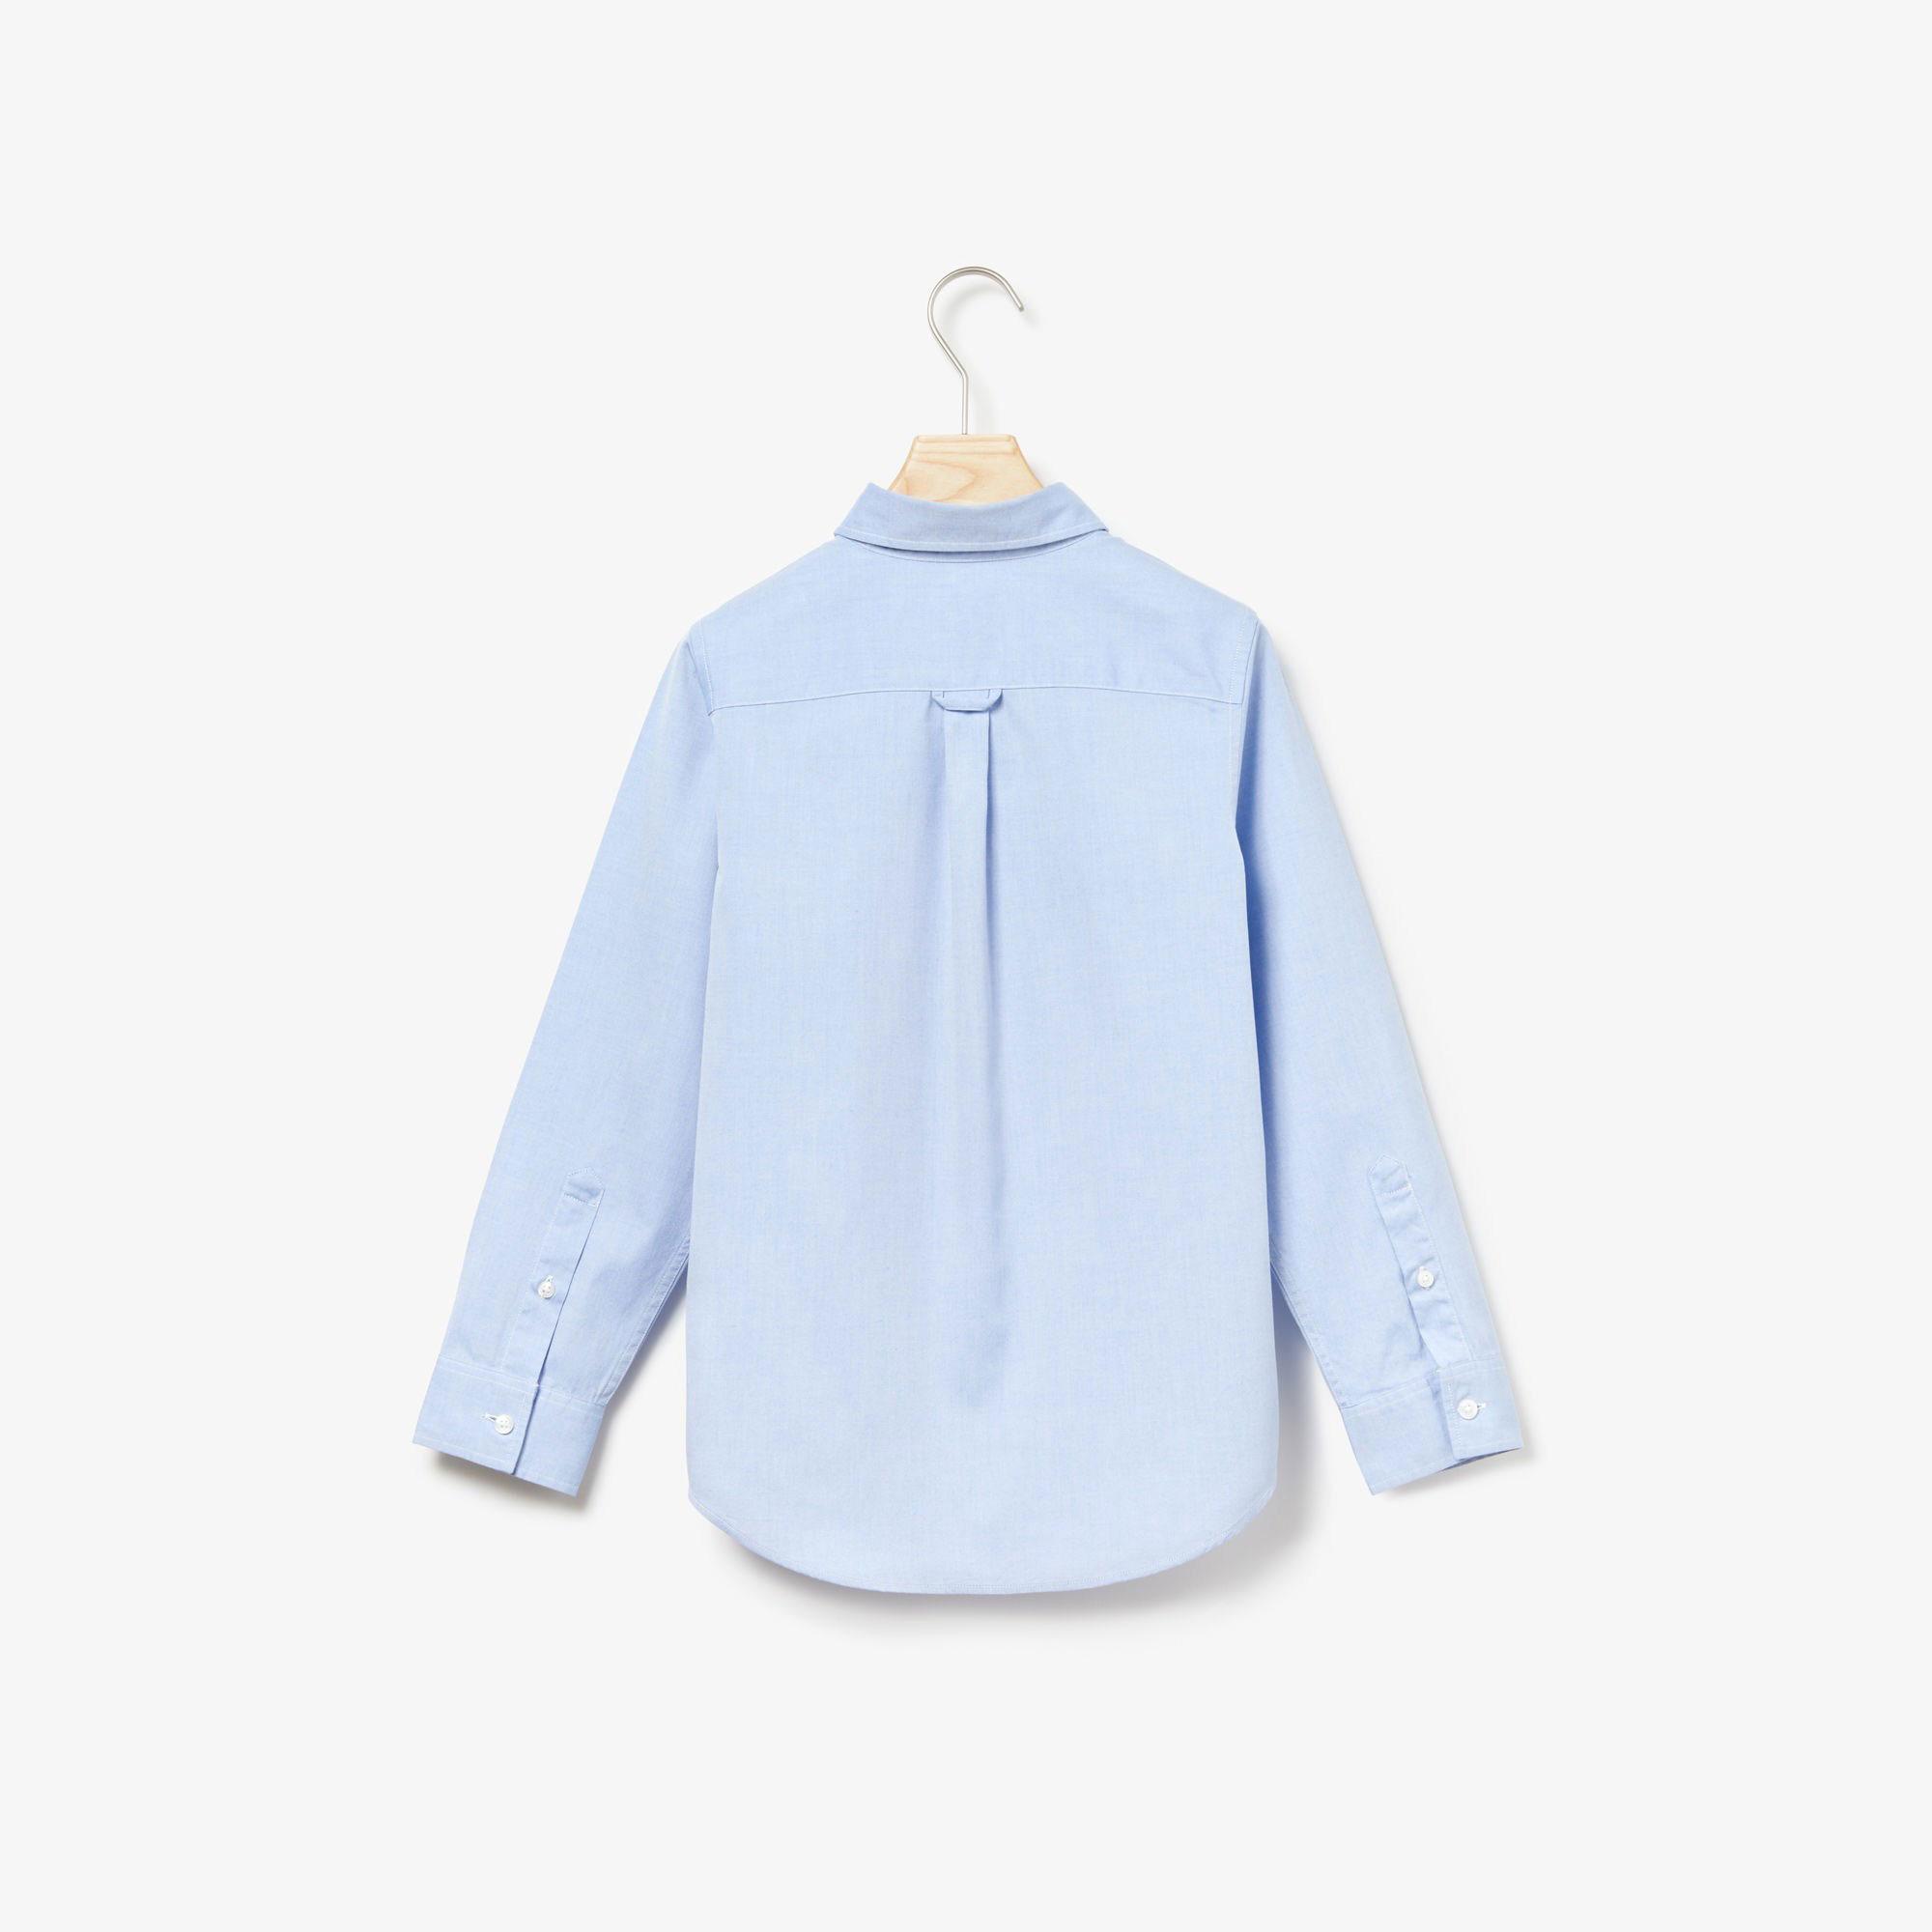 Lacoste Kids' Shirts